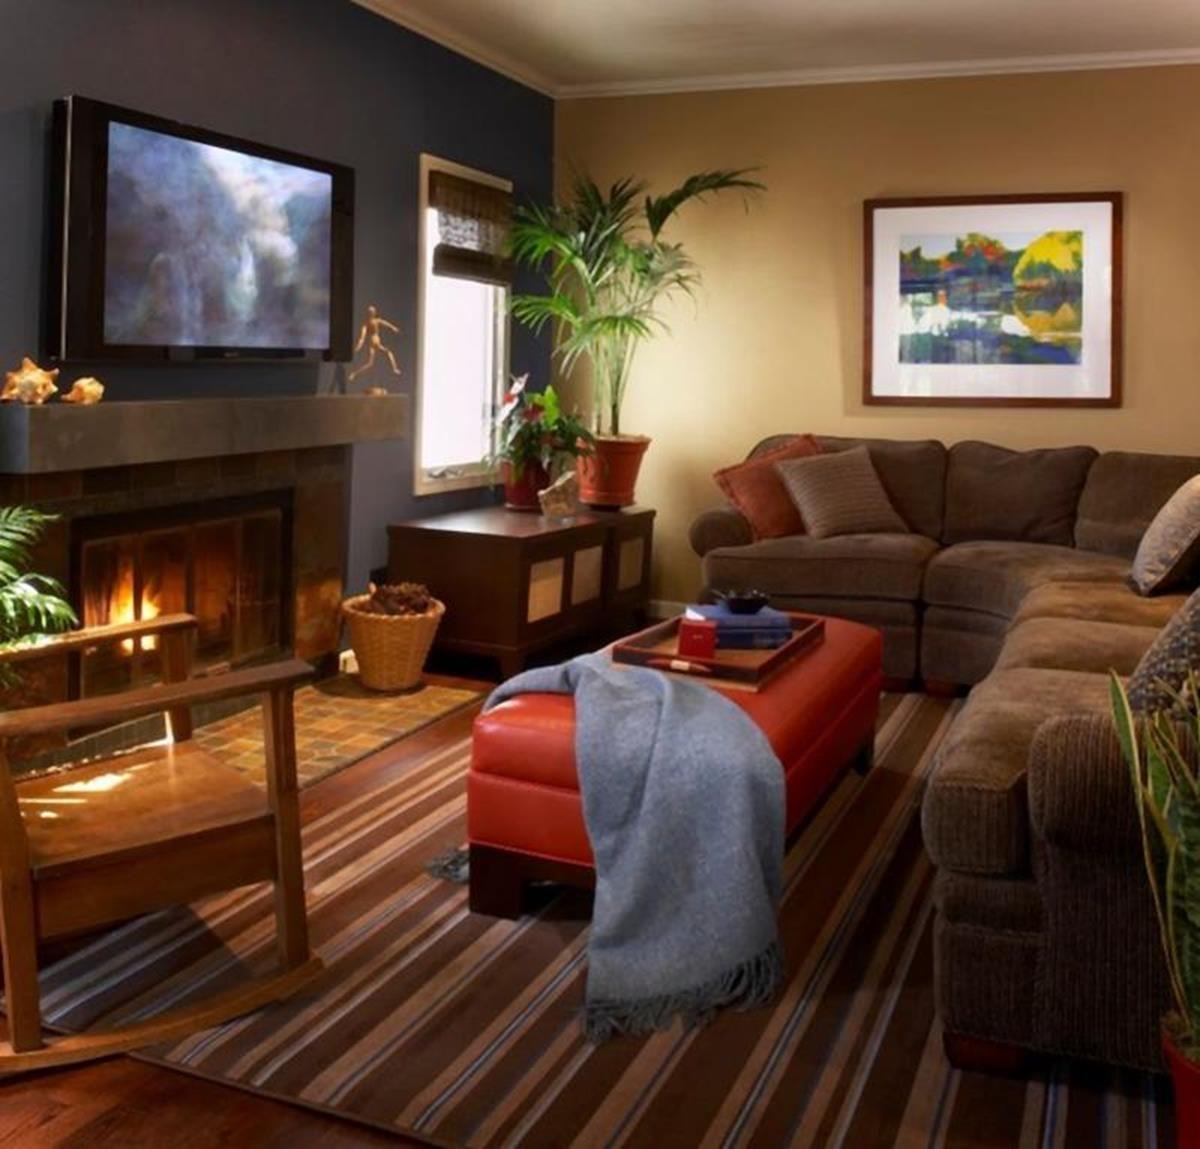 Warm Living Room Decorating Ideas 6 Living Room Warm Cosy Living Room Warm Living Room Colors Warm living room designs